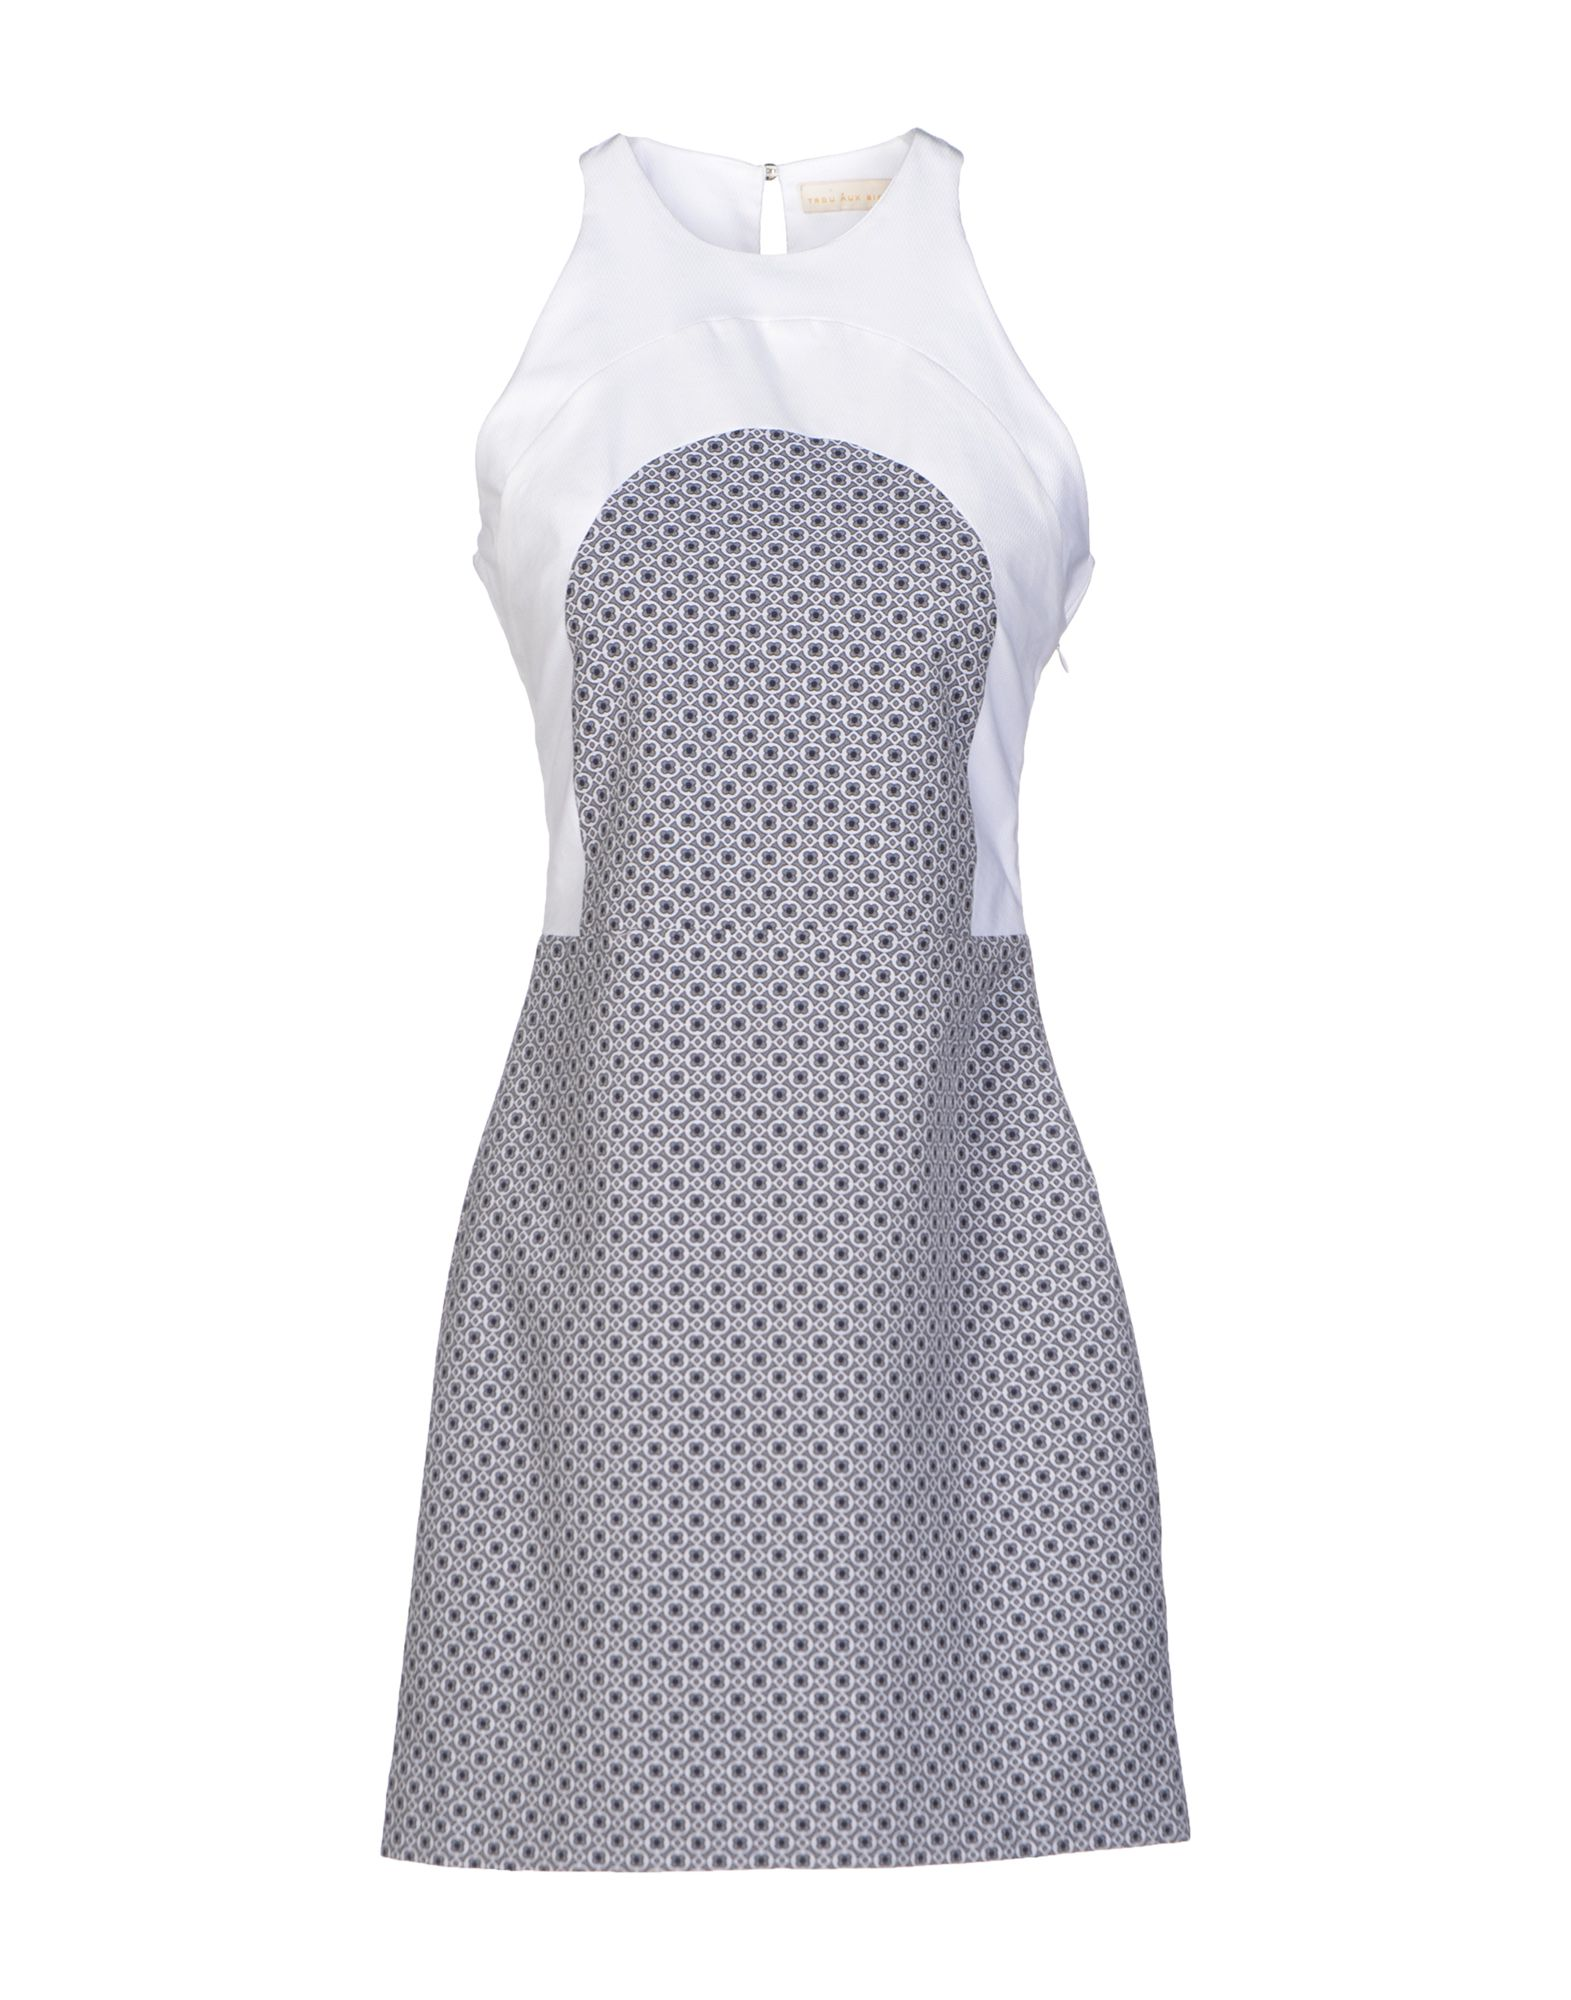 TROU AUX BICHES Короткое платье trou aux biches топ без рукавов